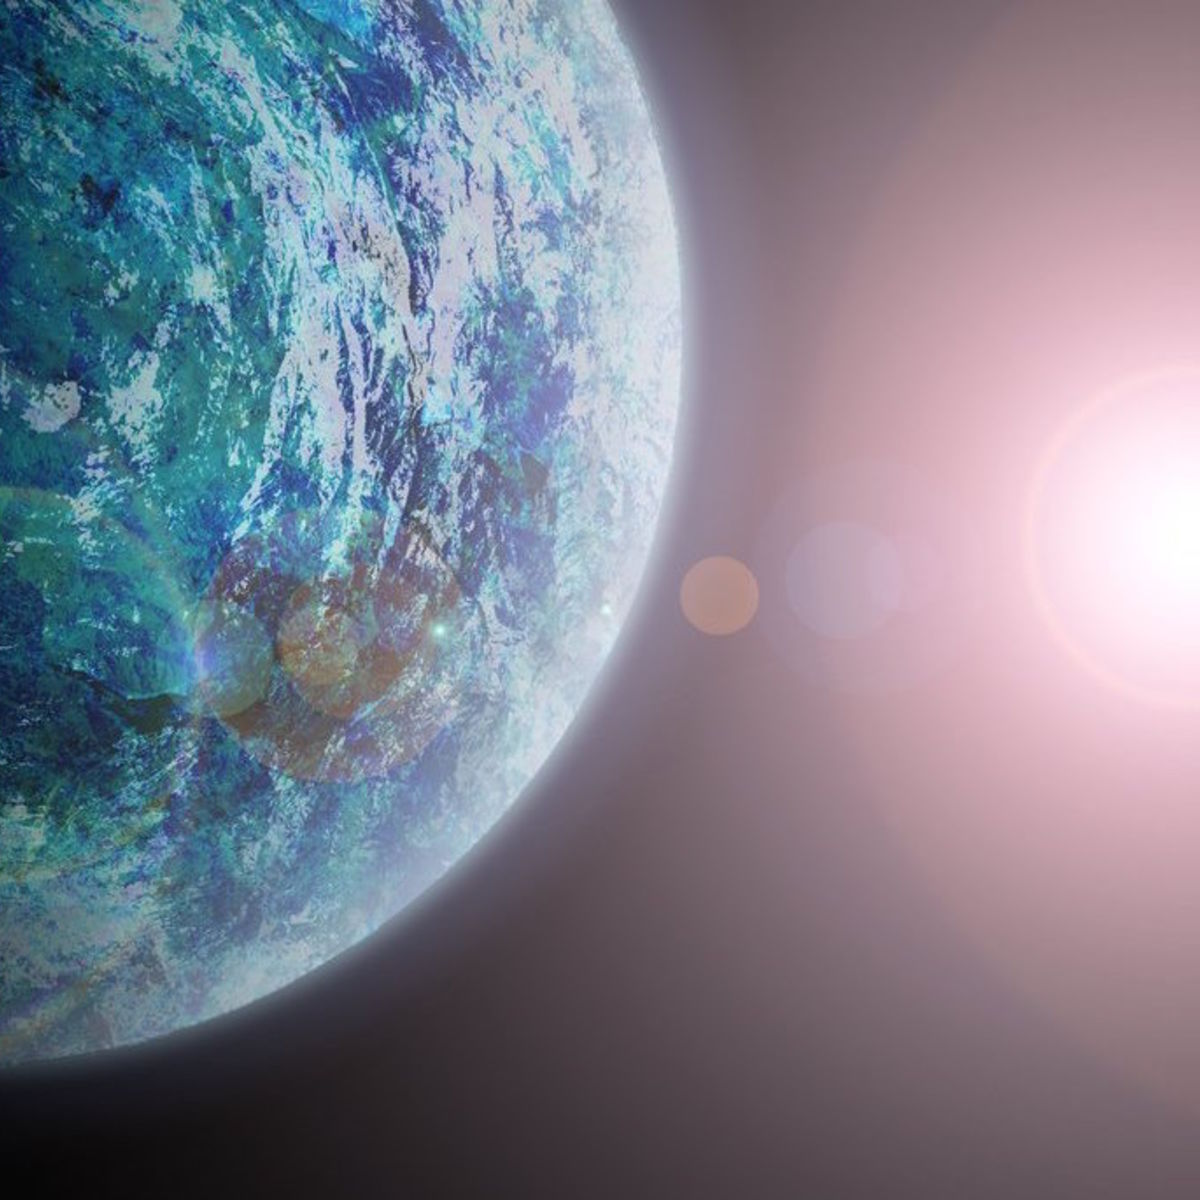 Exoplanet_no_HUD_by_mickare.jpg